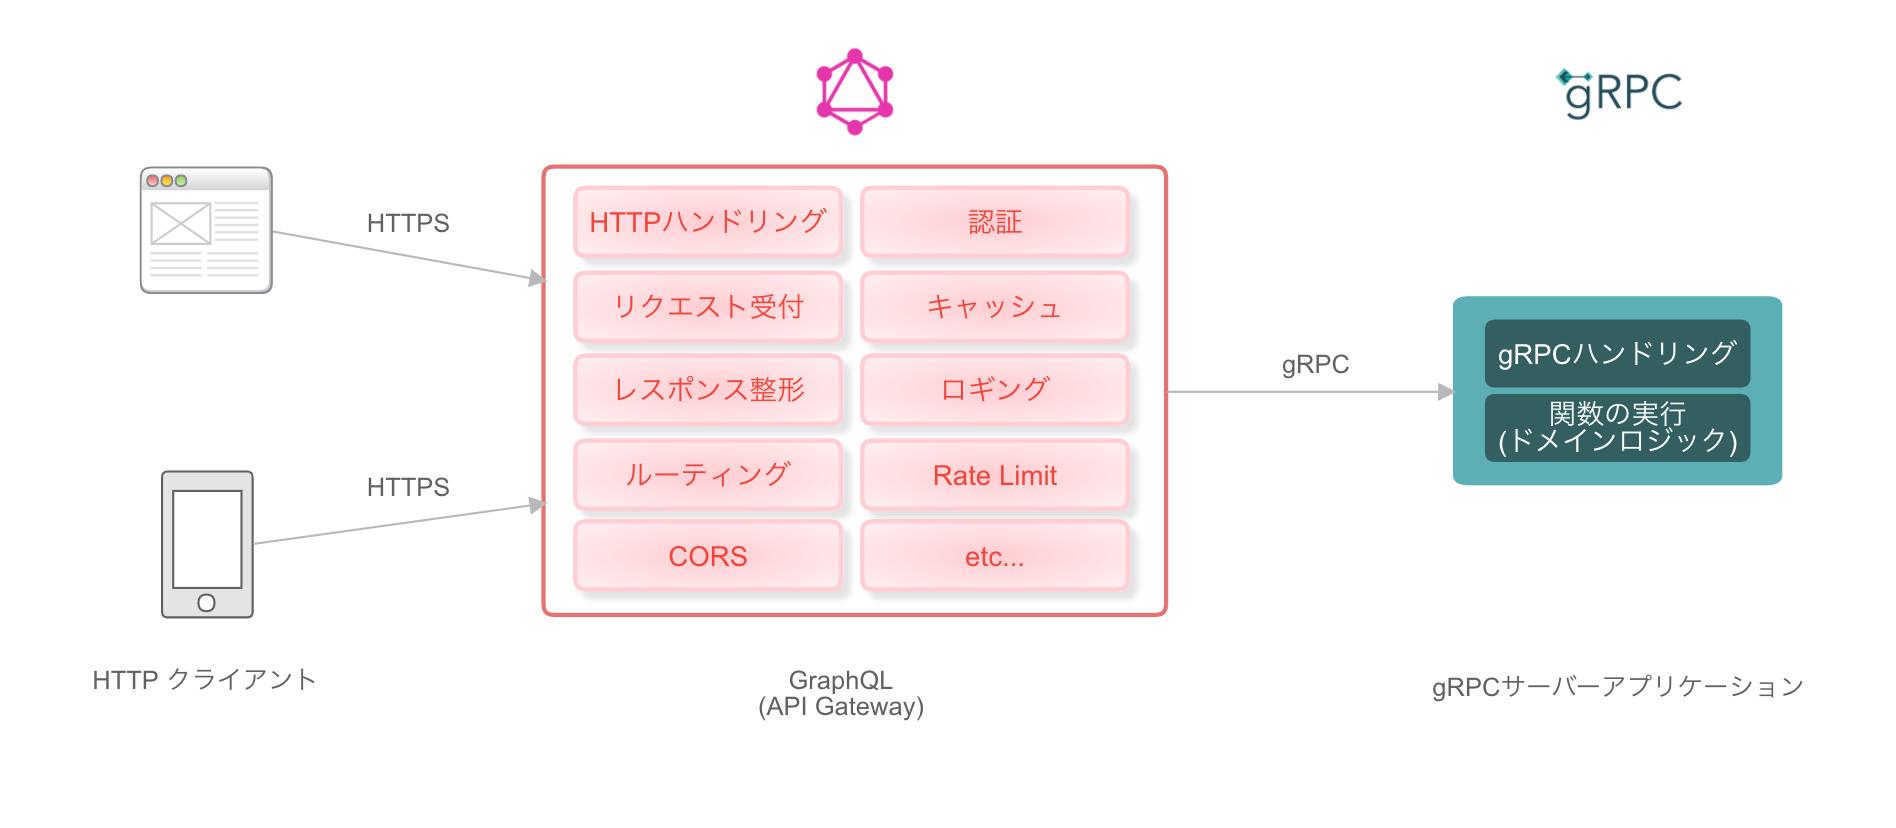 EBILAB_System_2019_08_登壇用_EBILAB_System_architecture_-_Cacoo.png